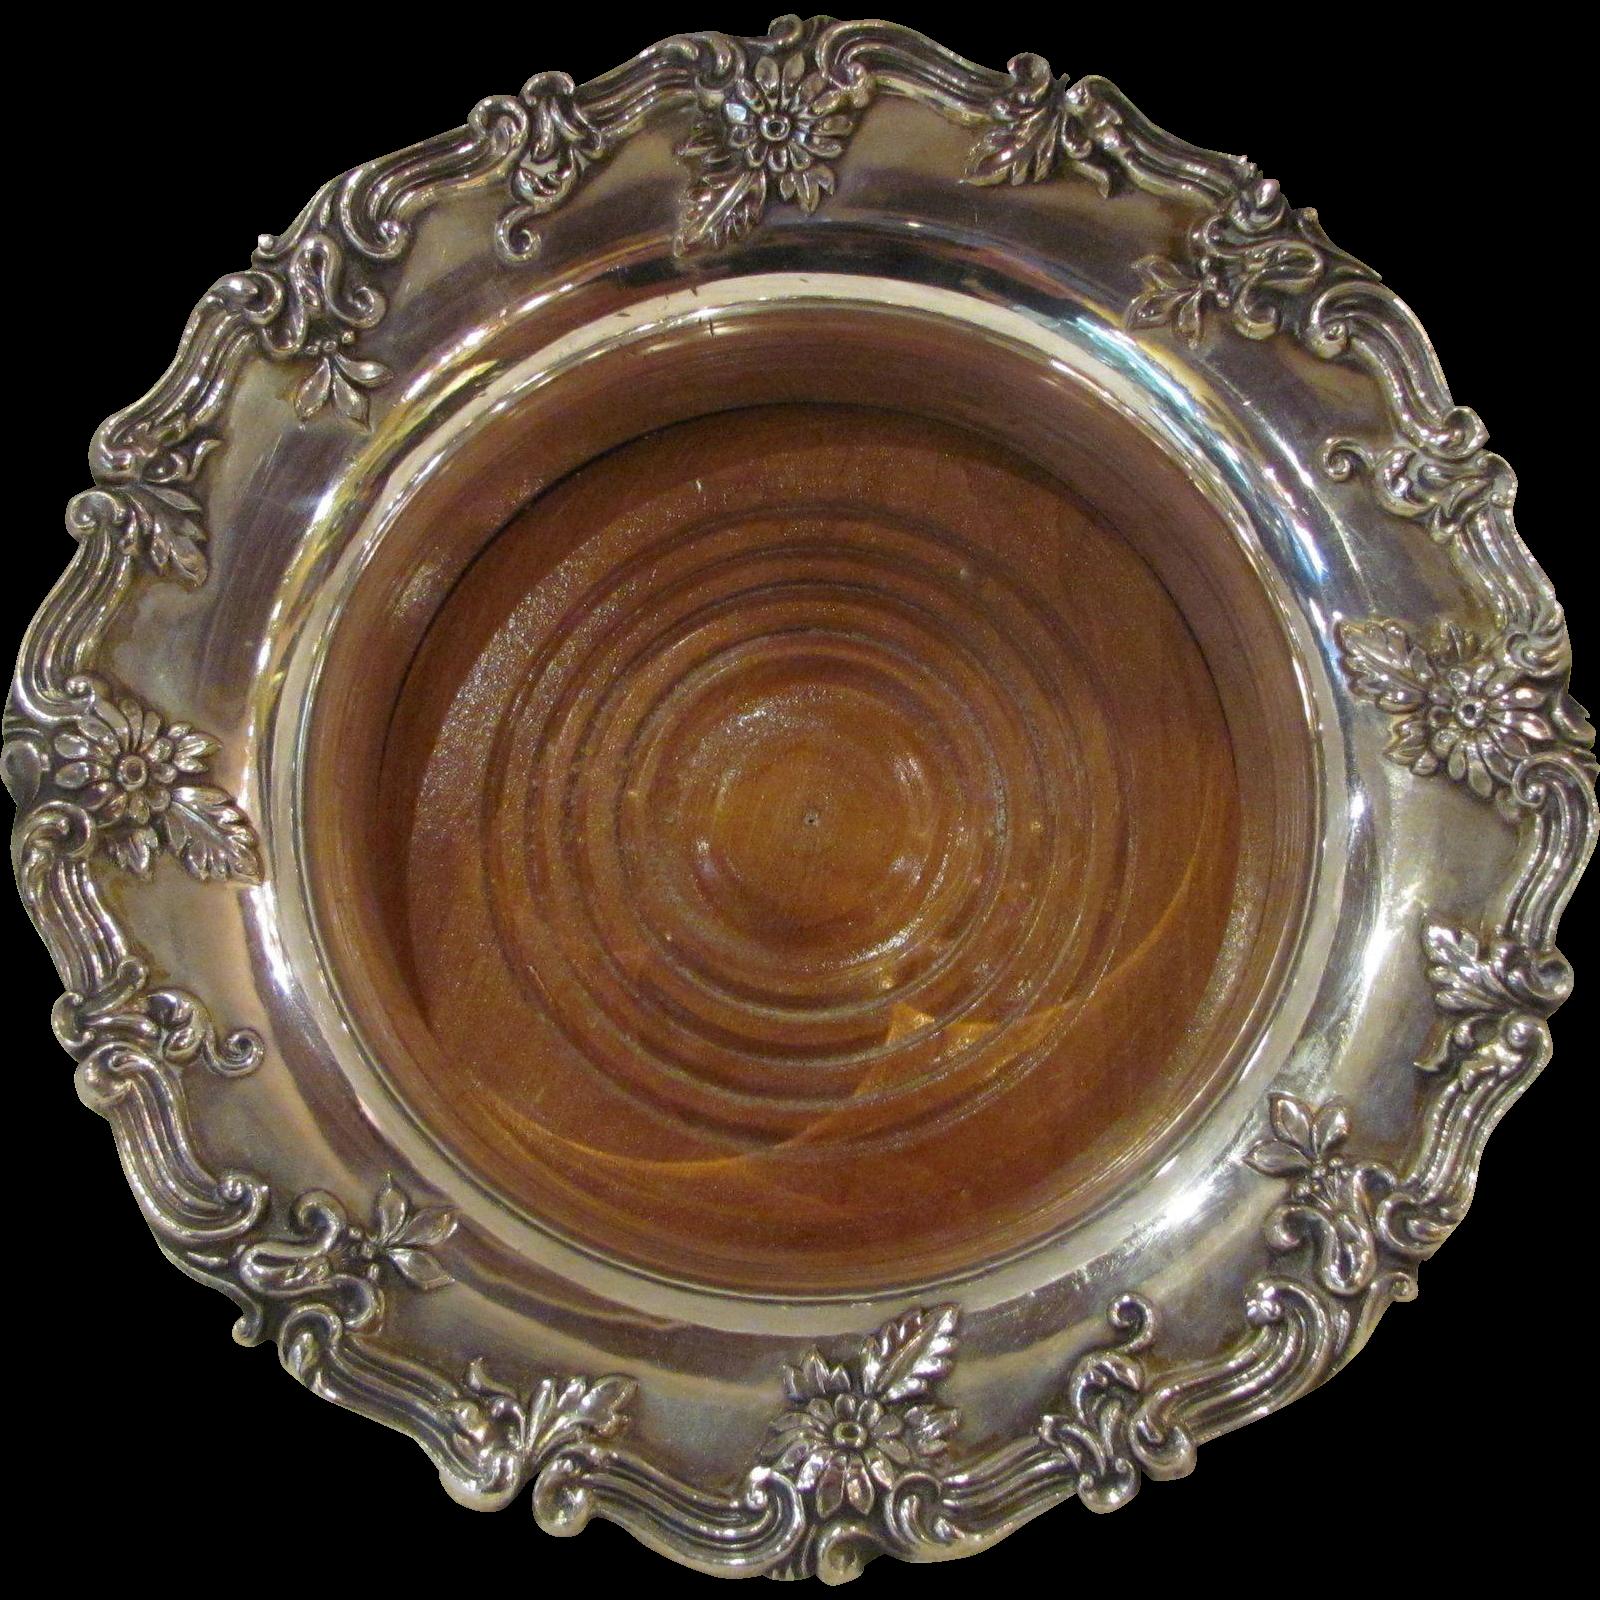 Vintage English Silverplate Wine Coaster 20th Century